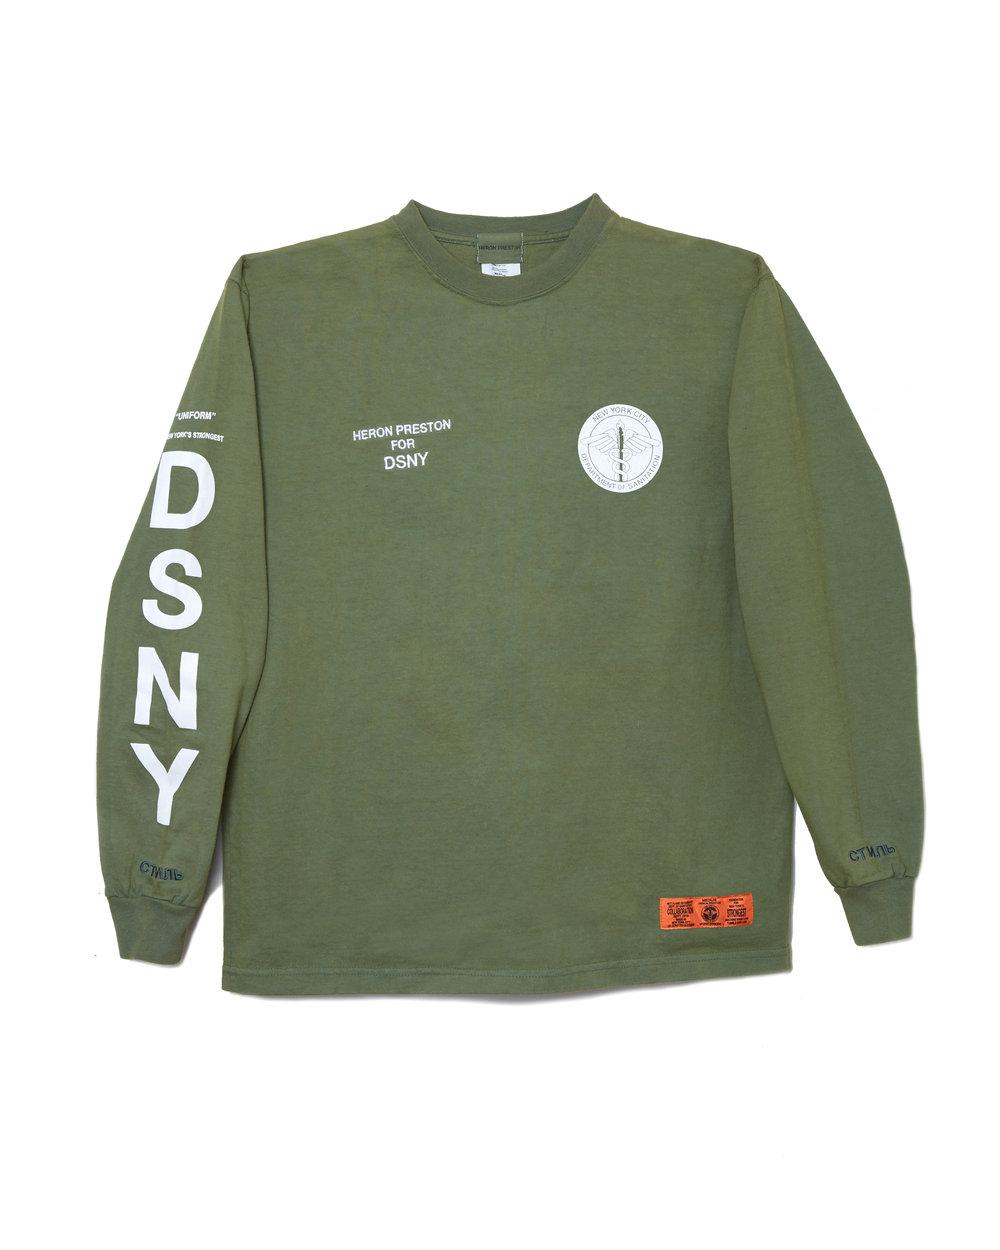 Heron Preston – Shirt